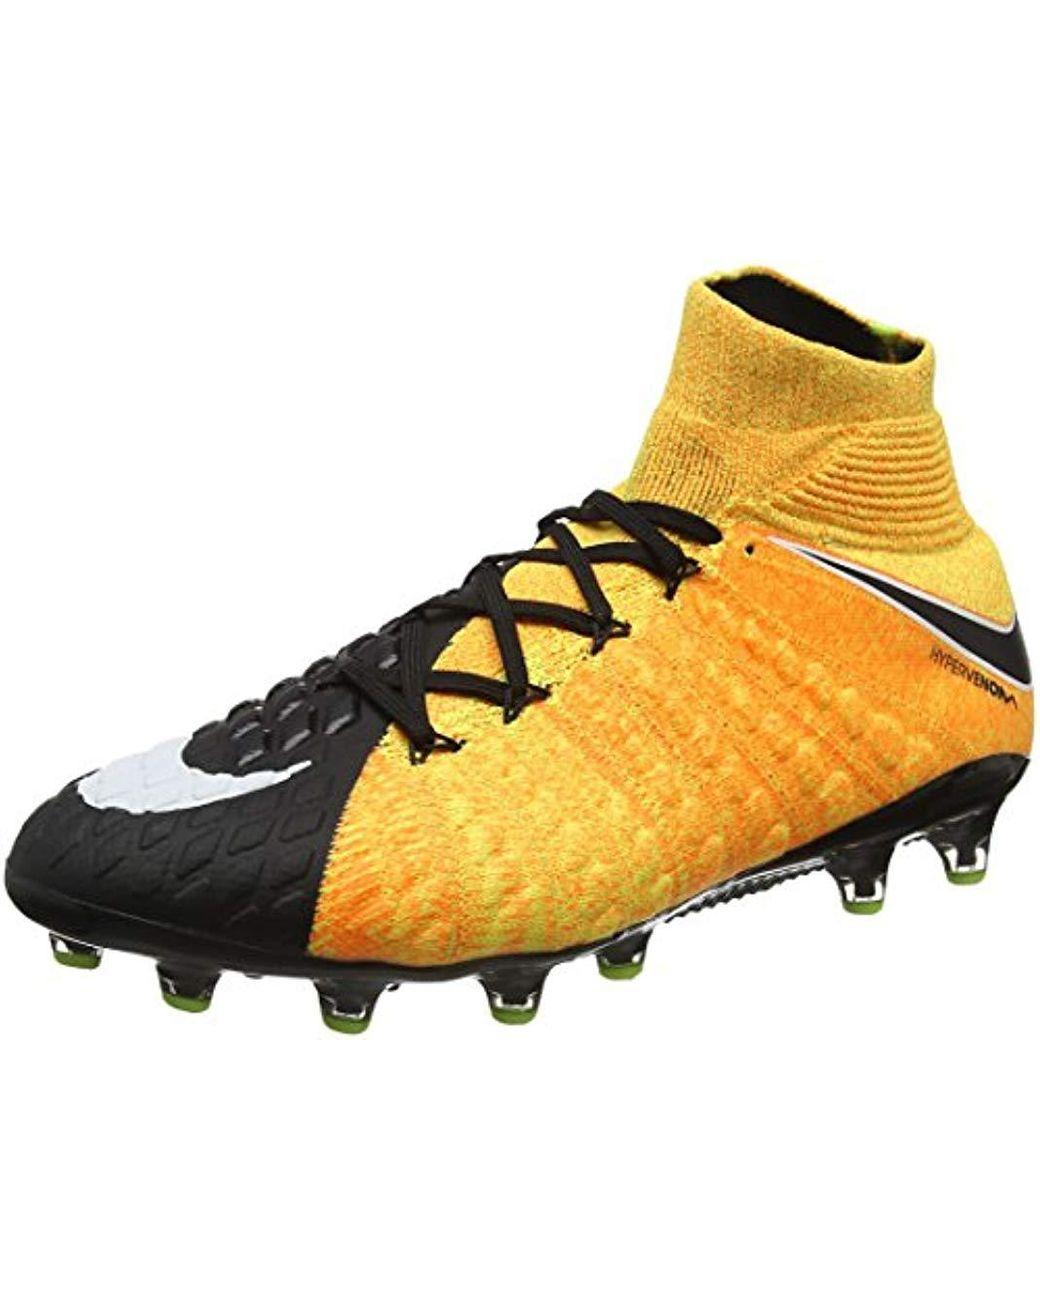 new product 84cab 2846c Men's Orange Hypervenom Phantom 3 Df Ag-pro Football Boots